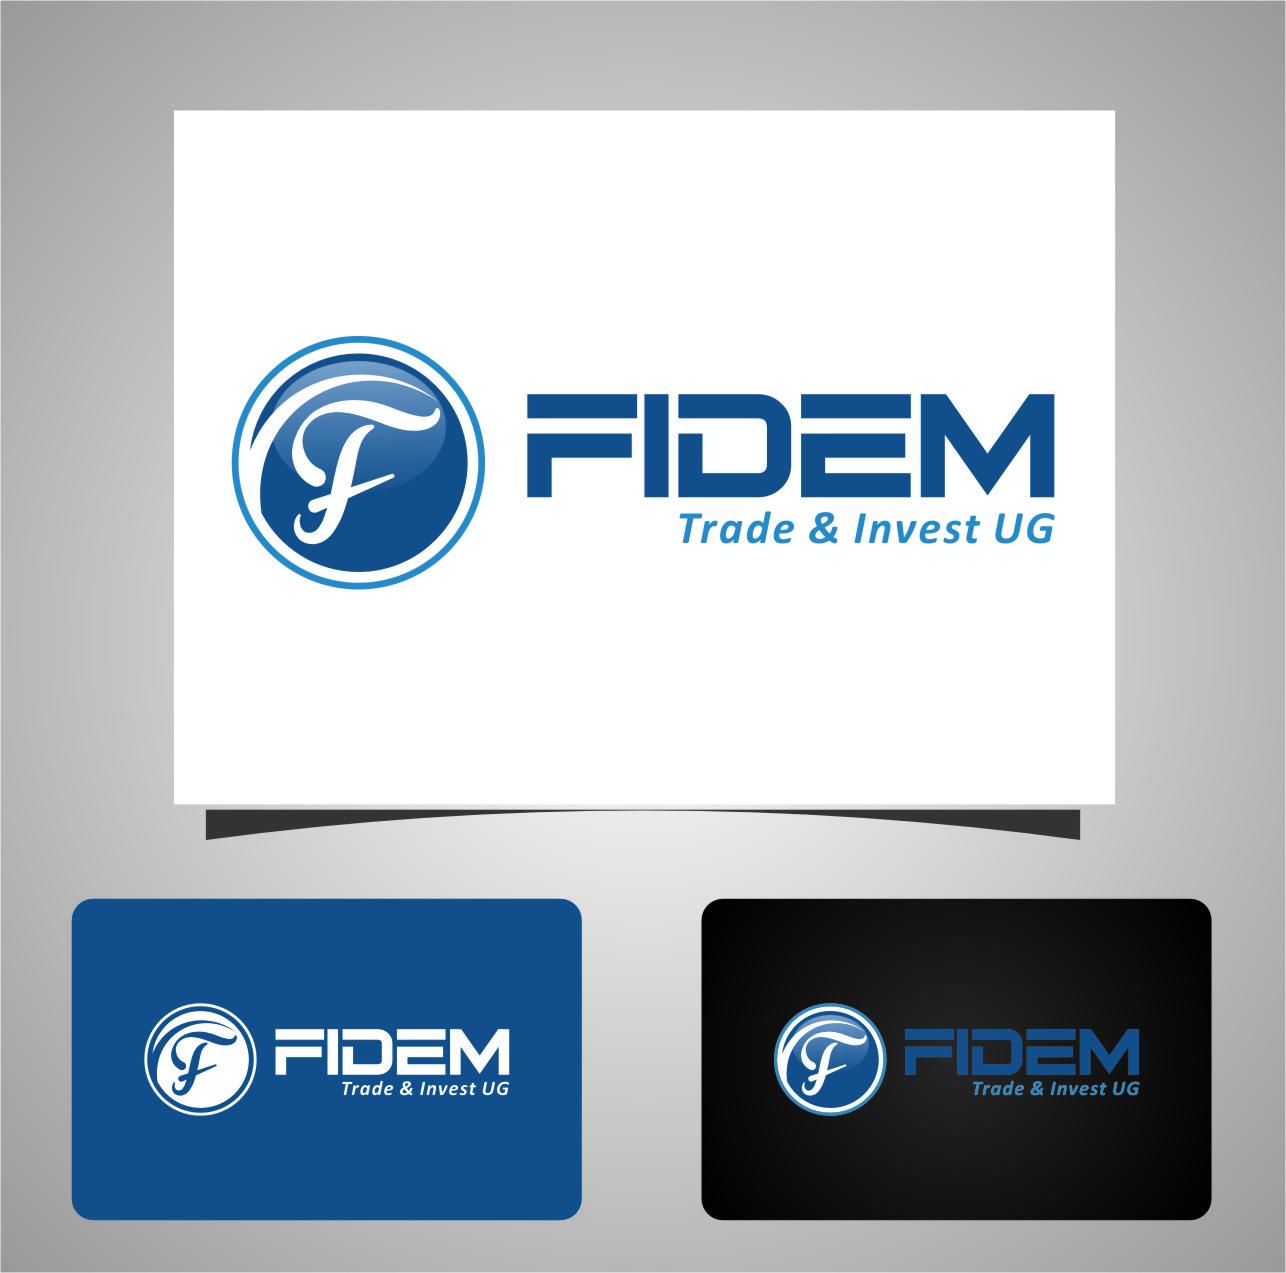 Logo Design by Ngepet_art - Entry No. 801 in the Logo Design Contest Professional Logo Design for FIDEM Trade & Invest UG.